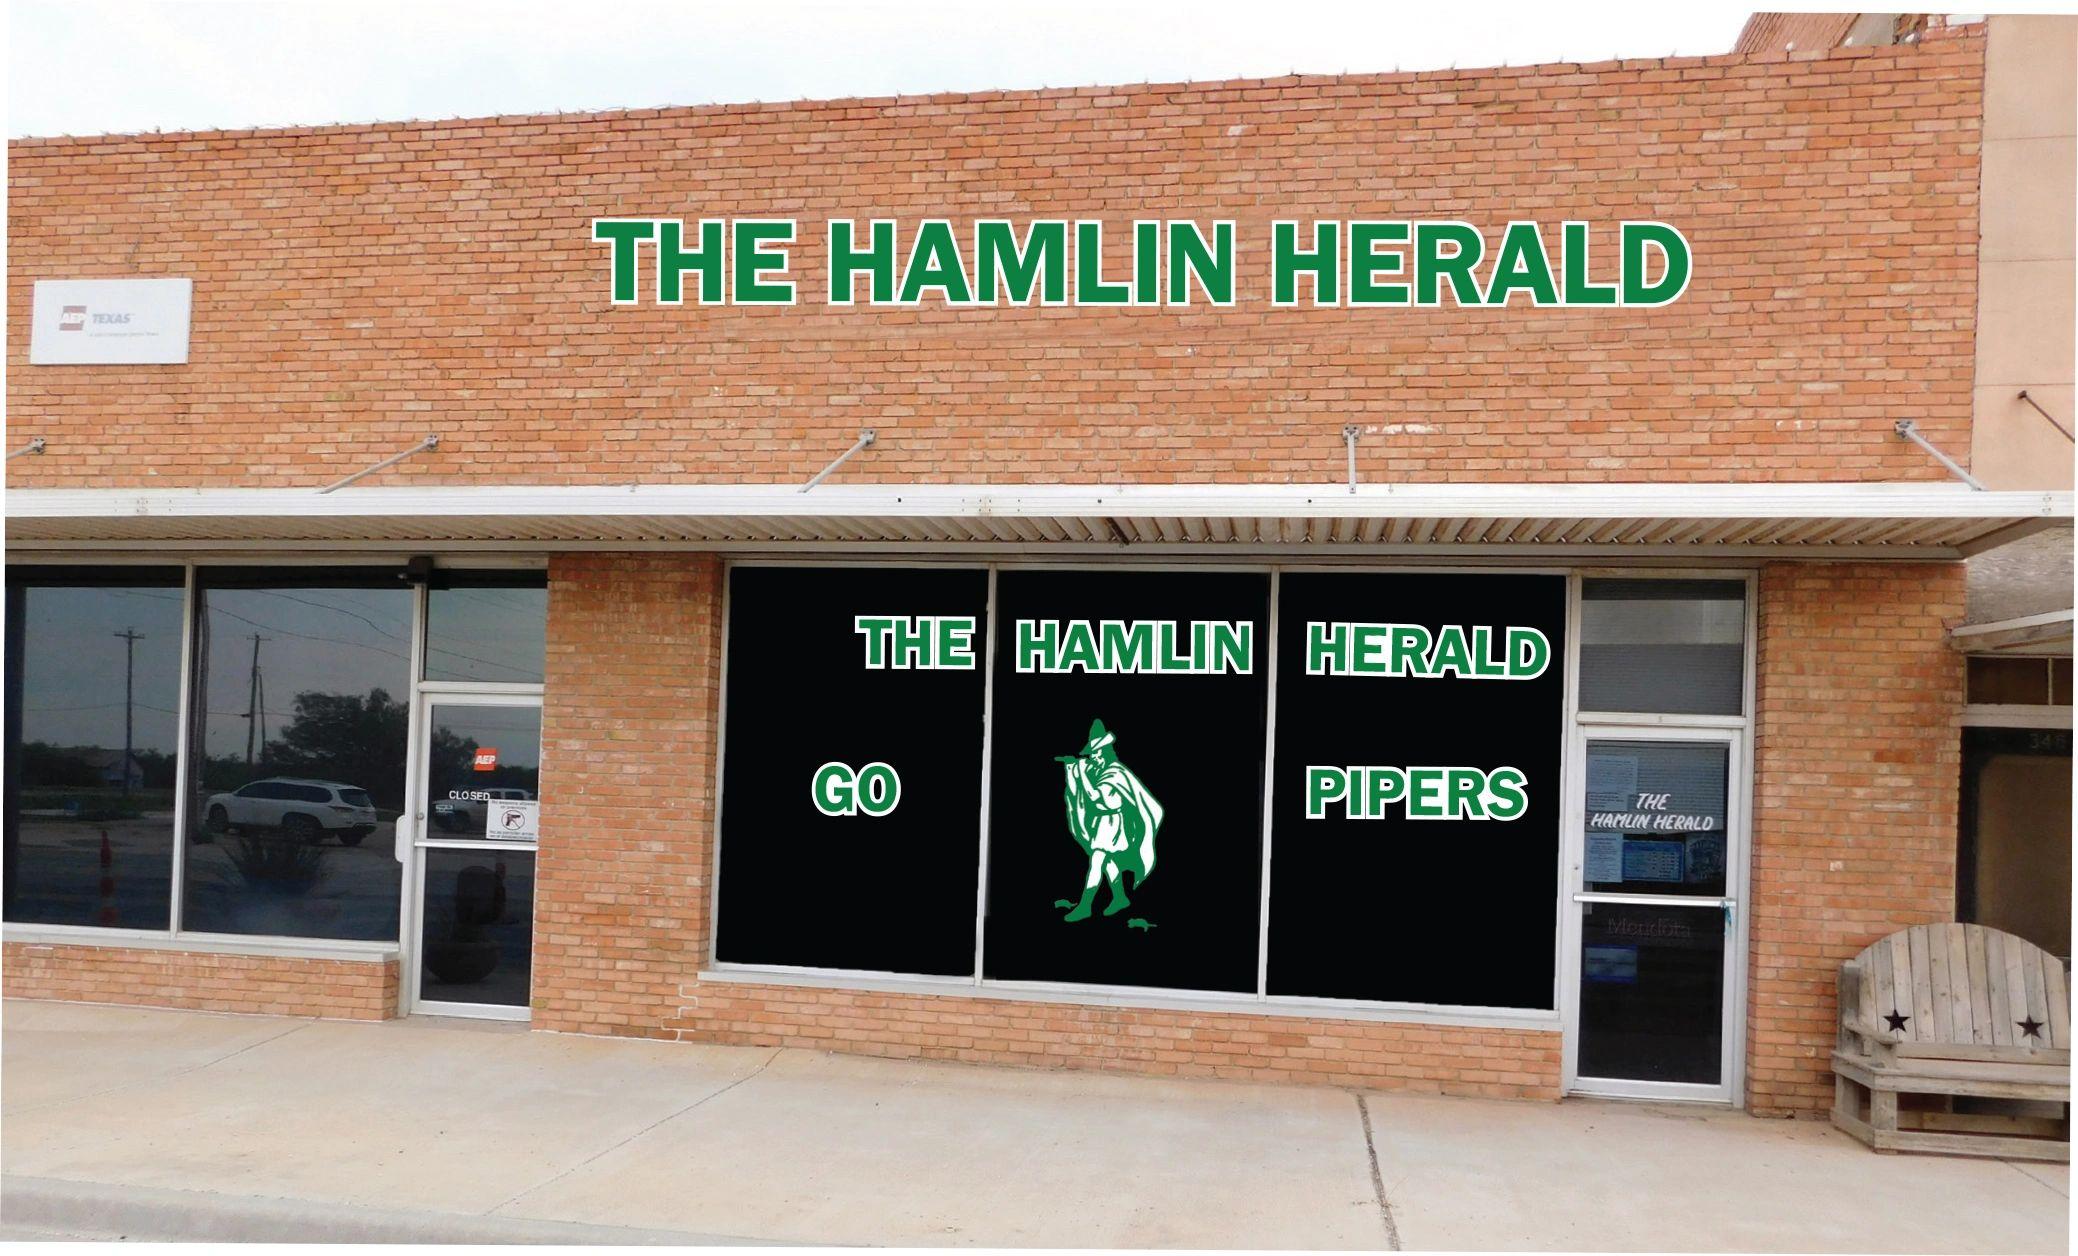 The Hamlin Herald